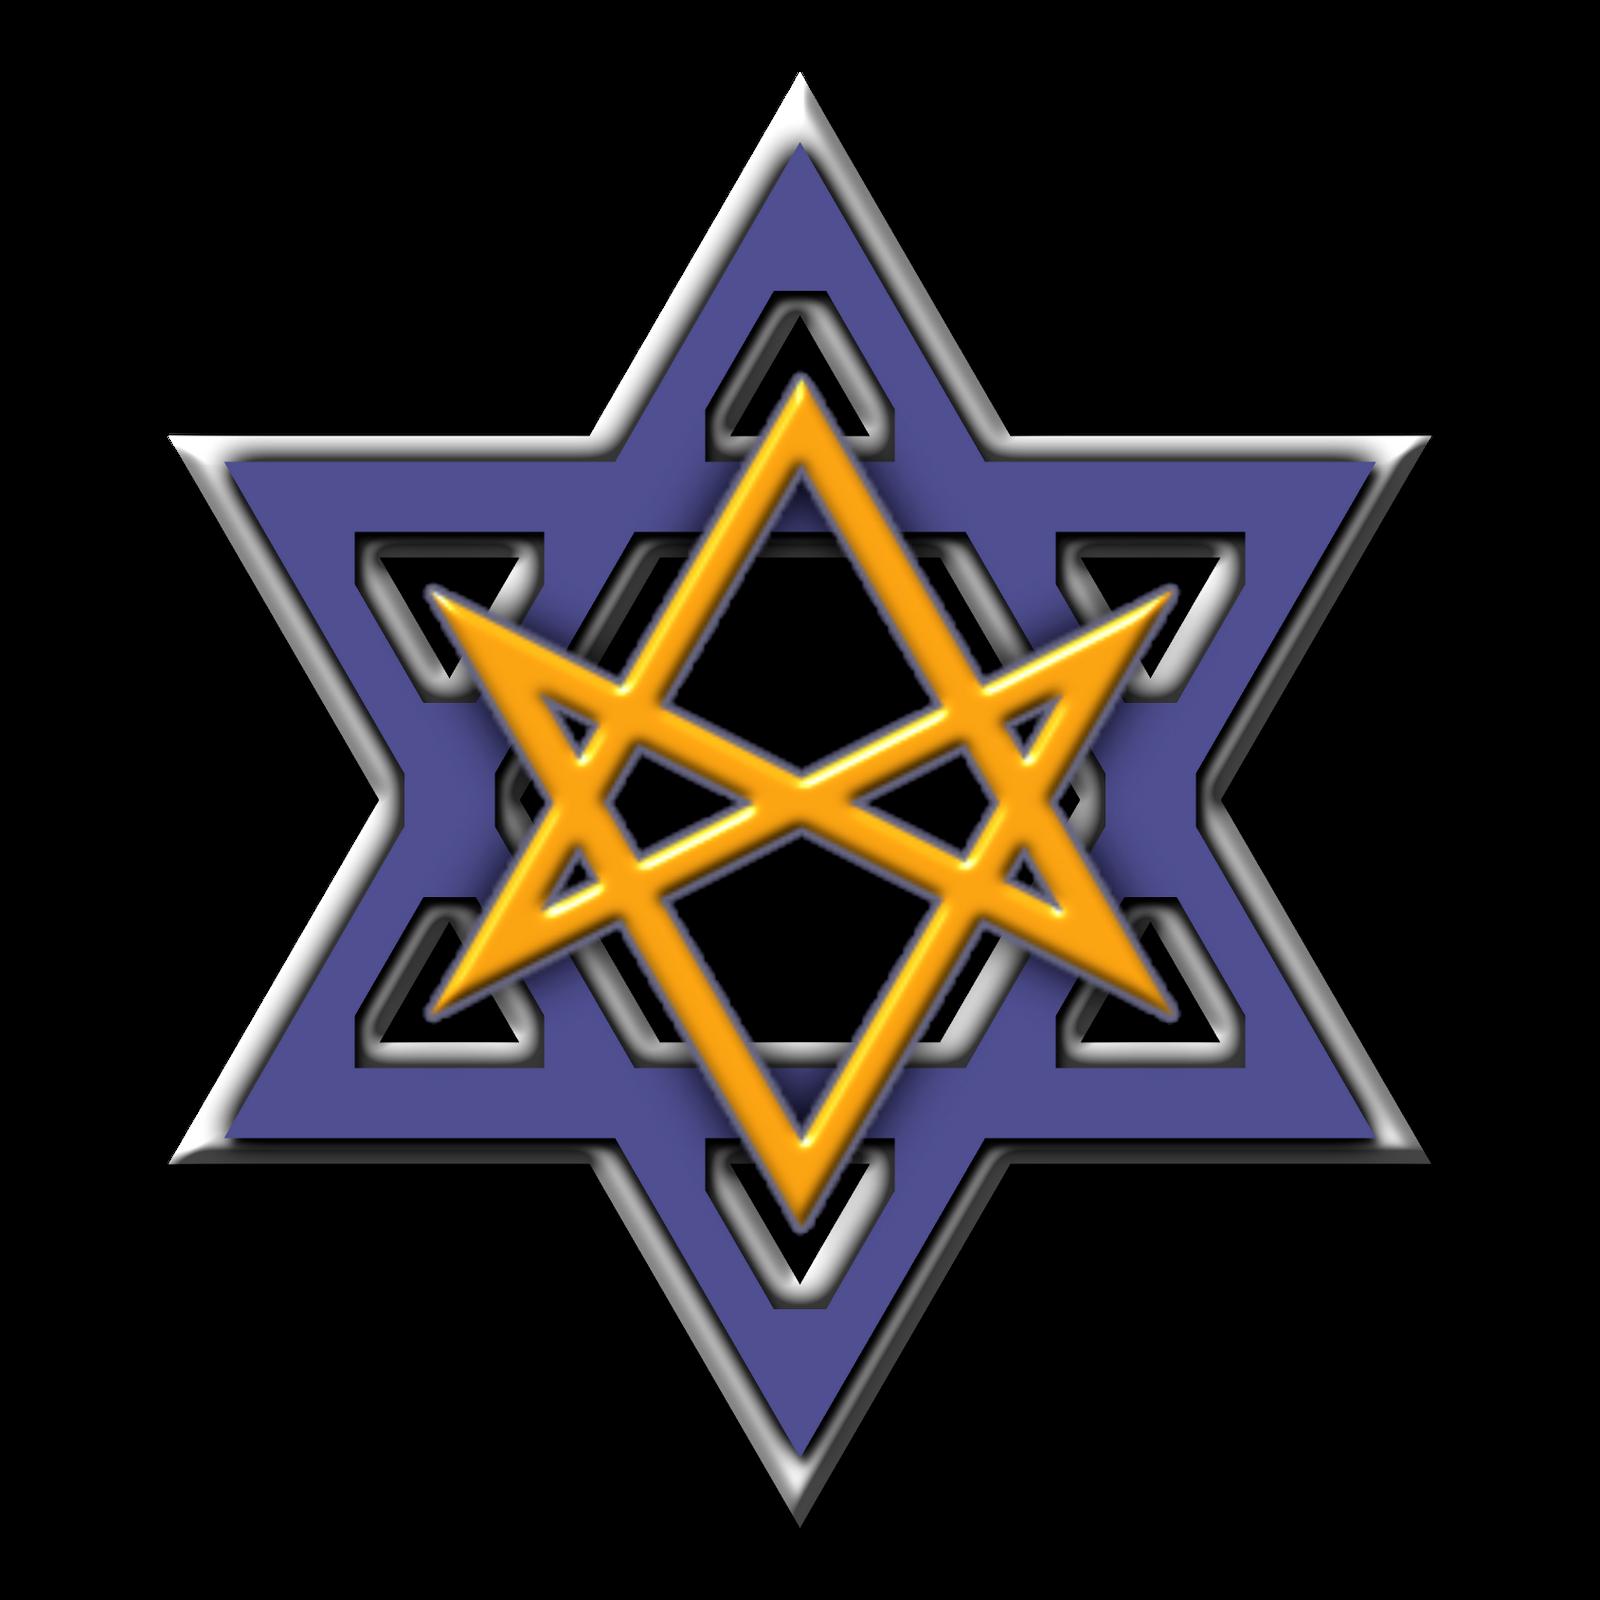 Jews as the chosen people